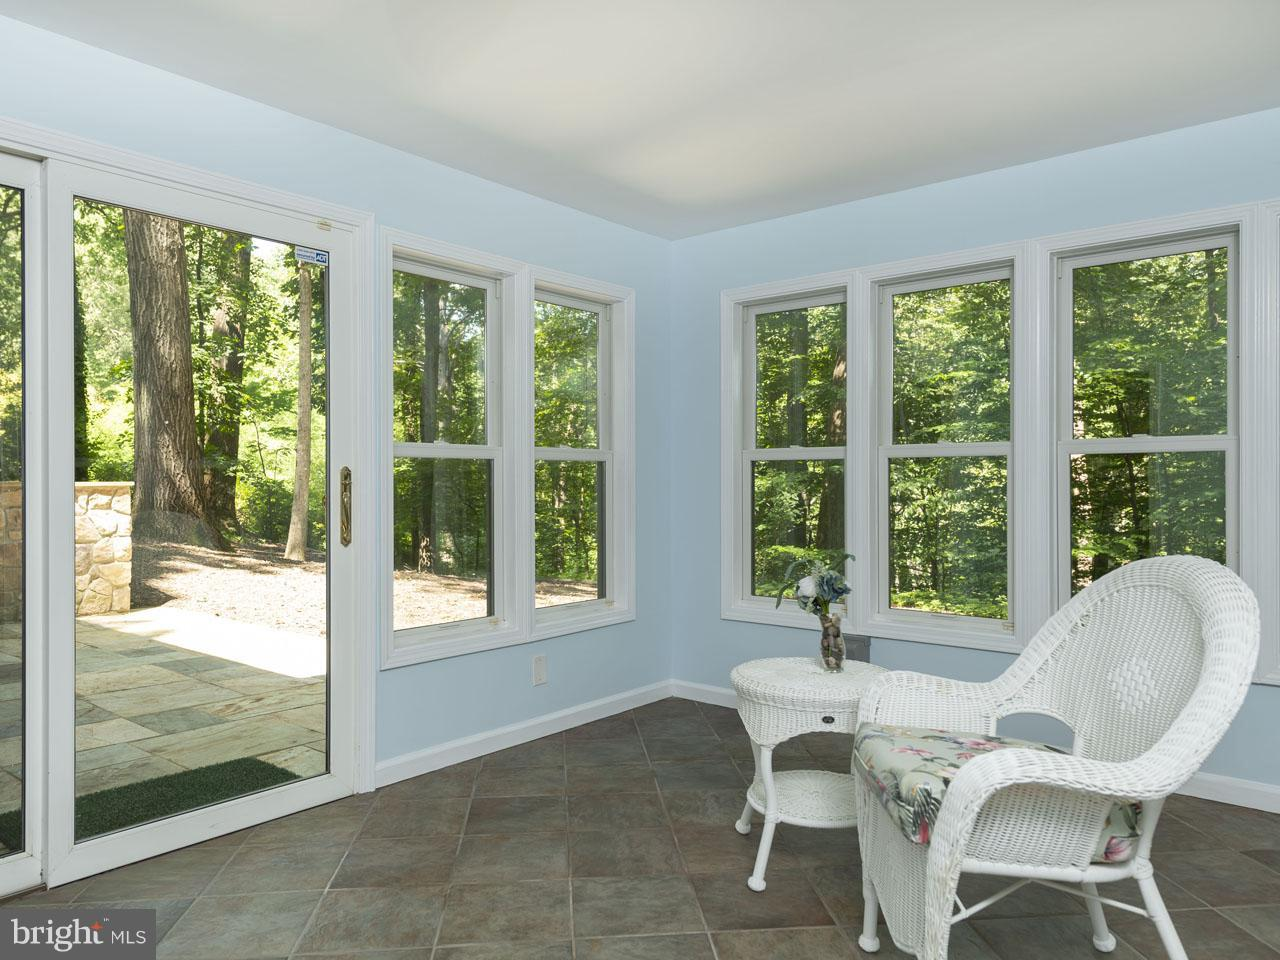 1002303700-300502417919-2021-07-22-03-27-23  |   | Alexandria Delaware Real Estate For Sale | MLS# 1002303700  - Best of Northern Virginia